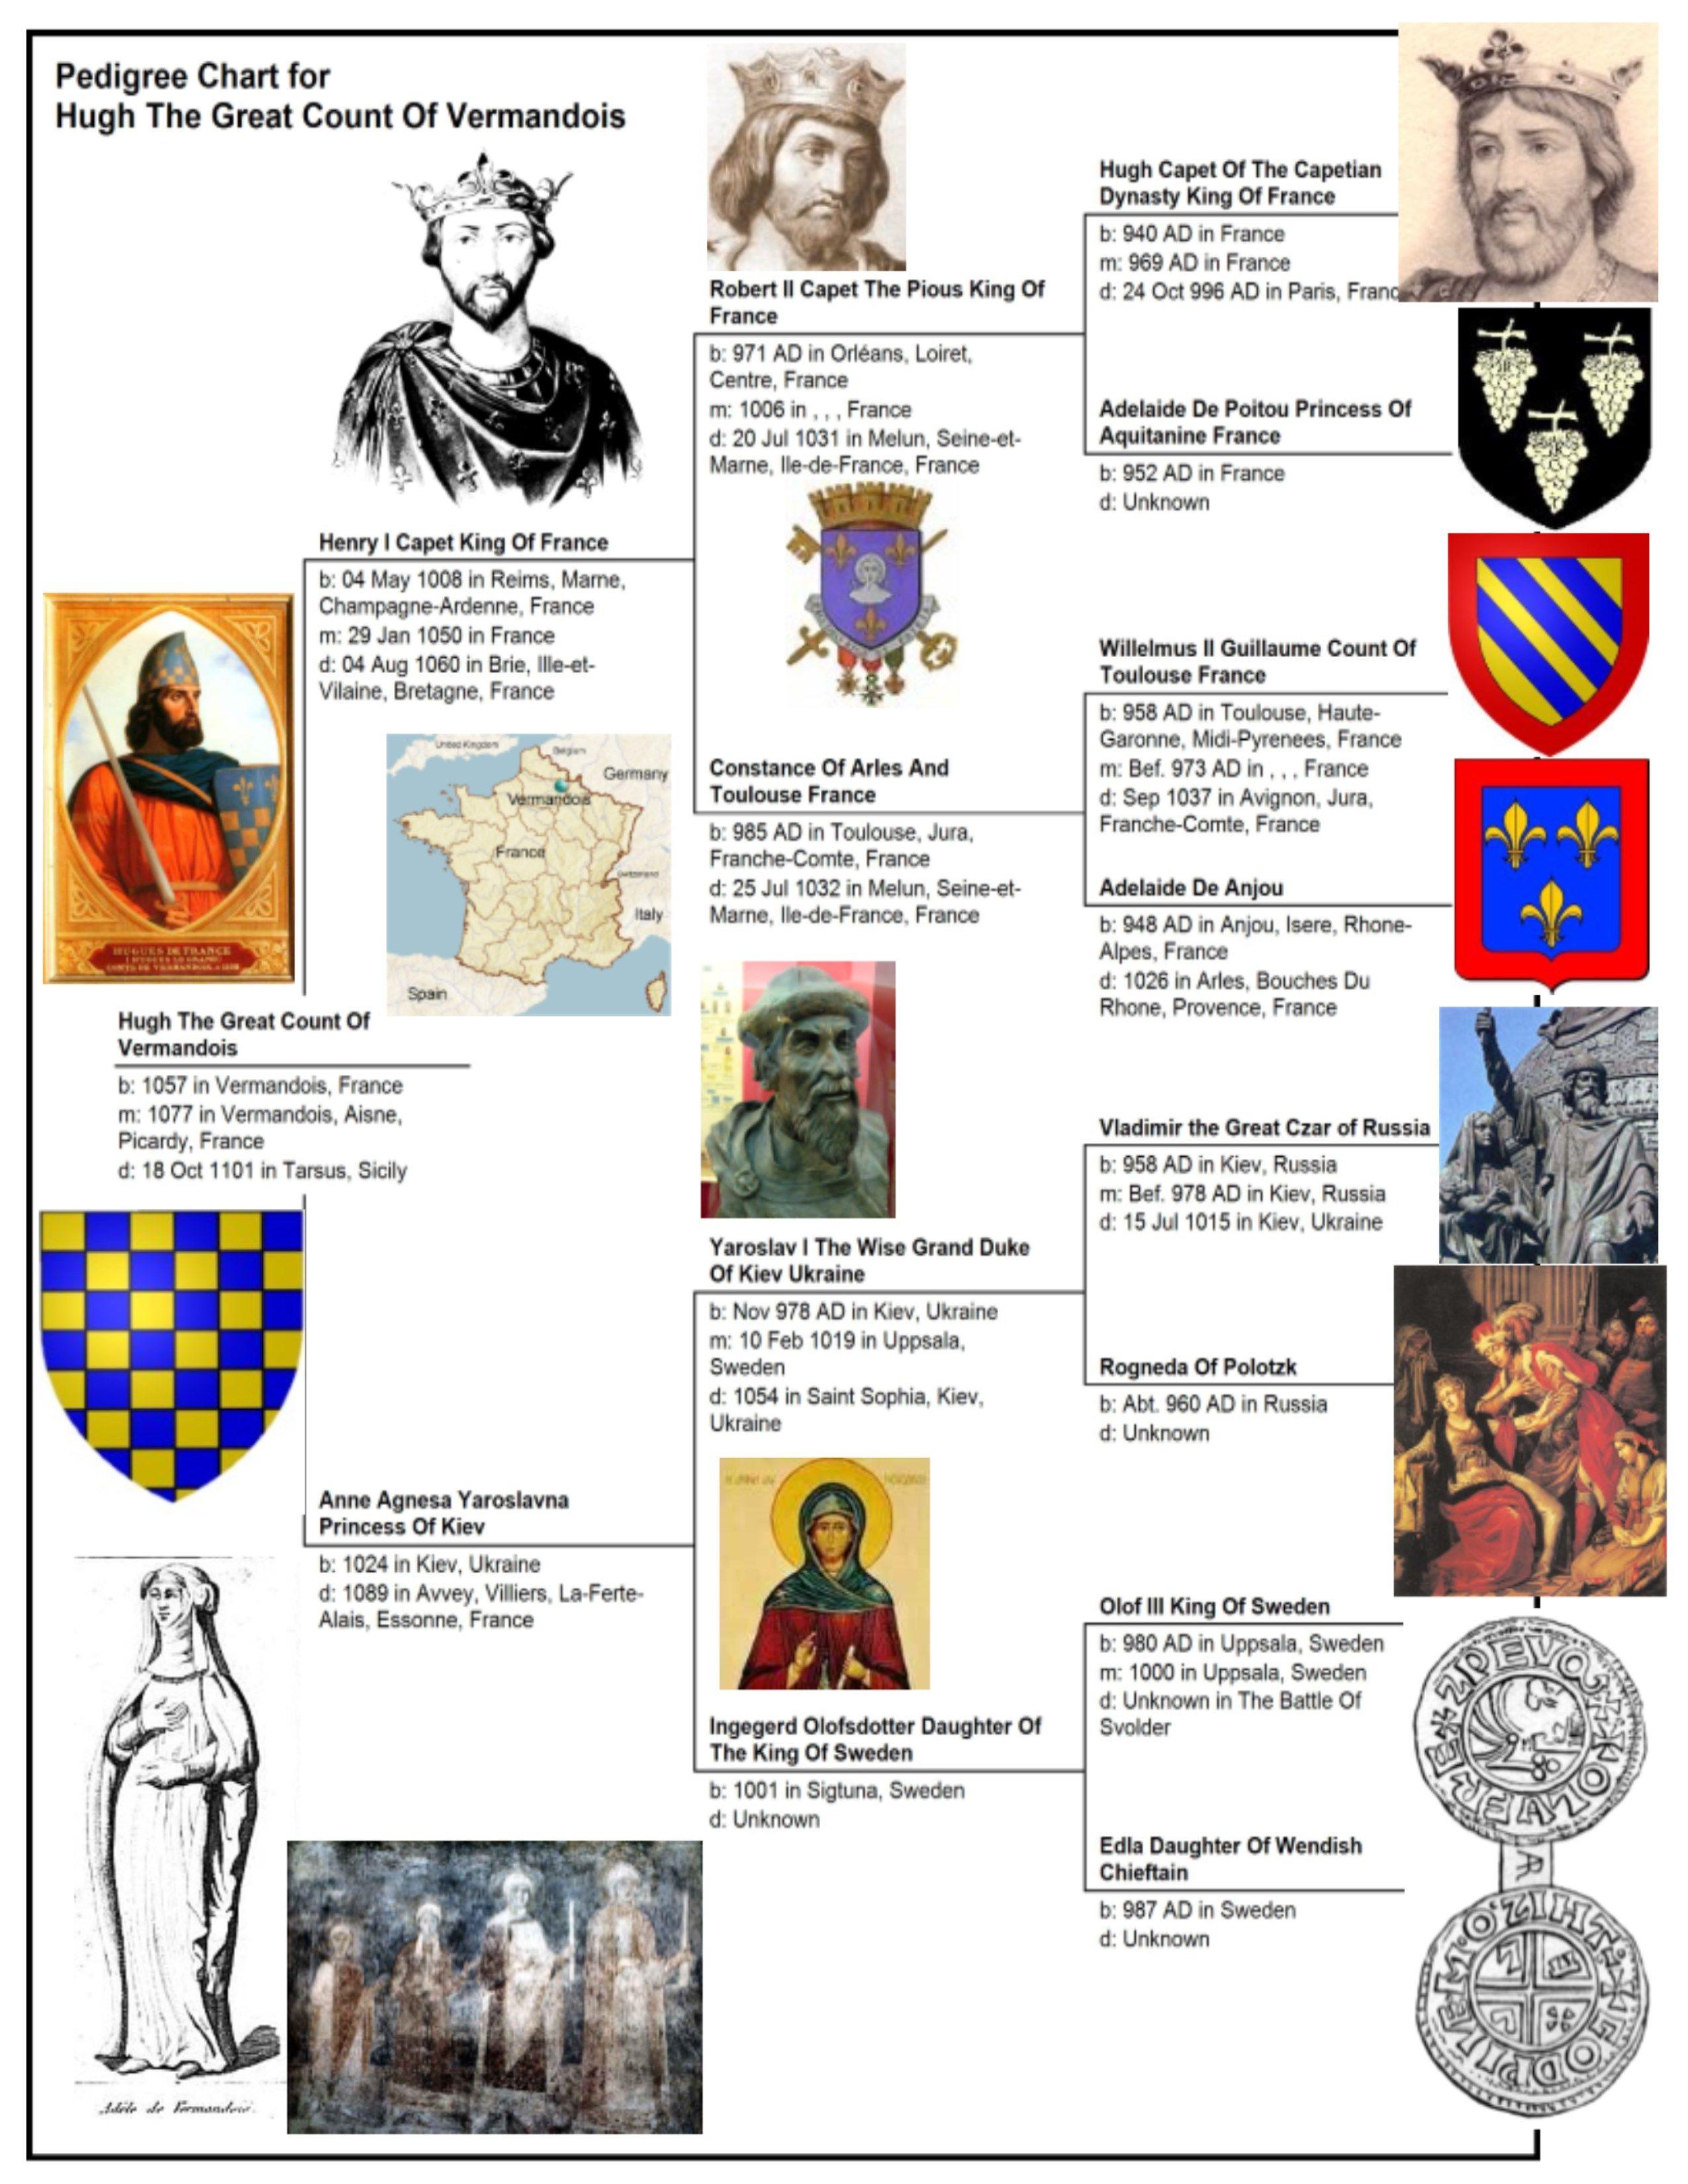 1057 Hugh The Great Pedigree Chart Family Tree History Genealogy History Family Genealogy